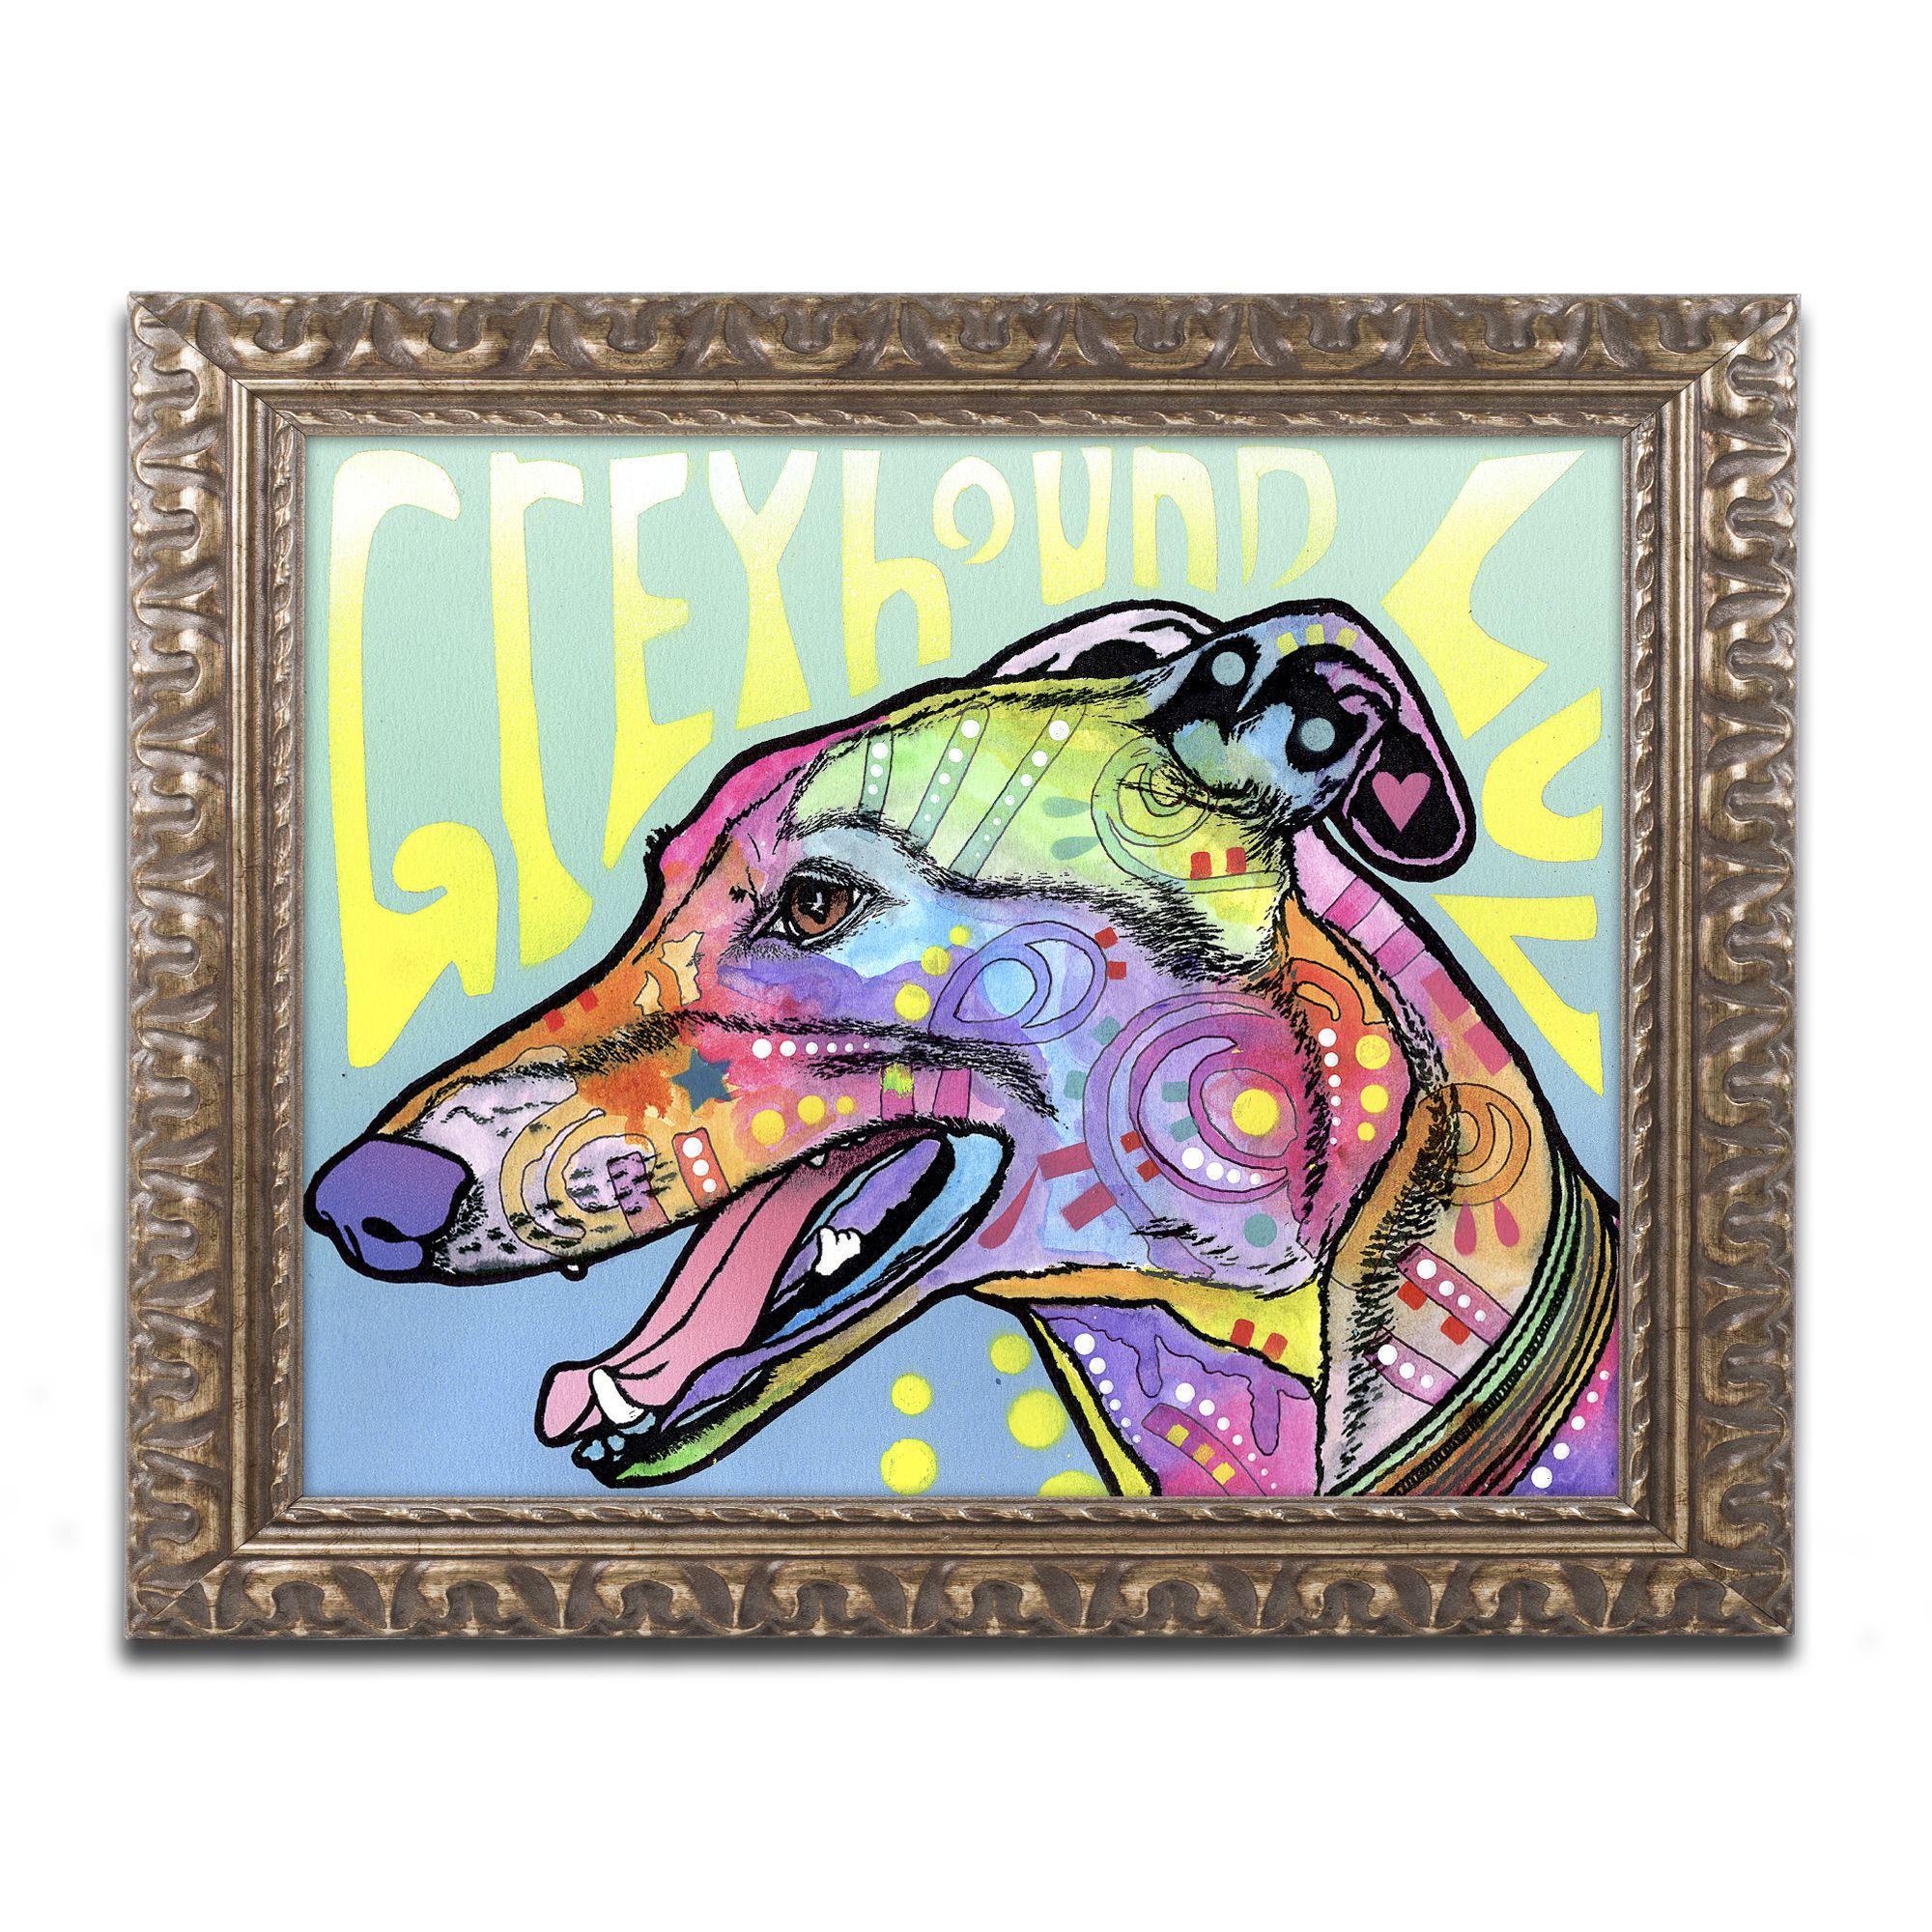 Dean Russo 'Greyhound Luv' Ornate Framed Art